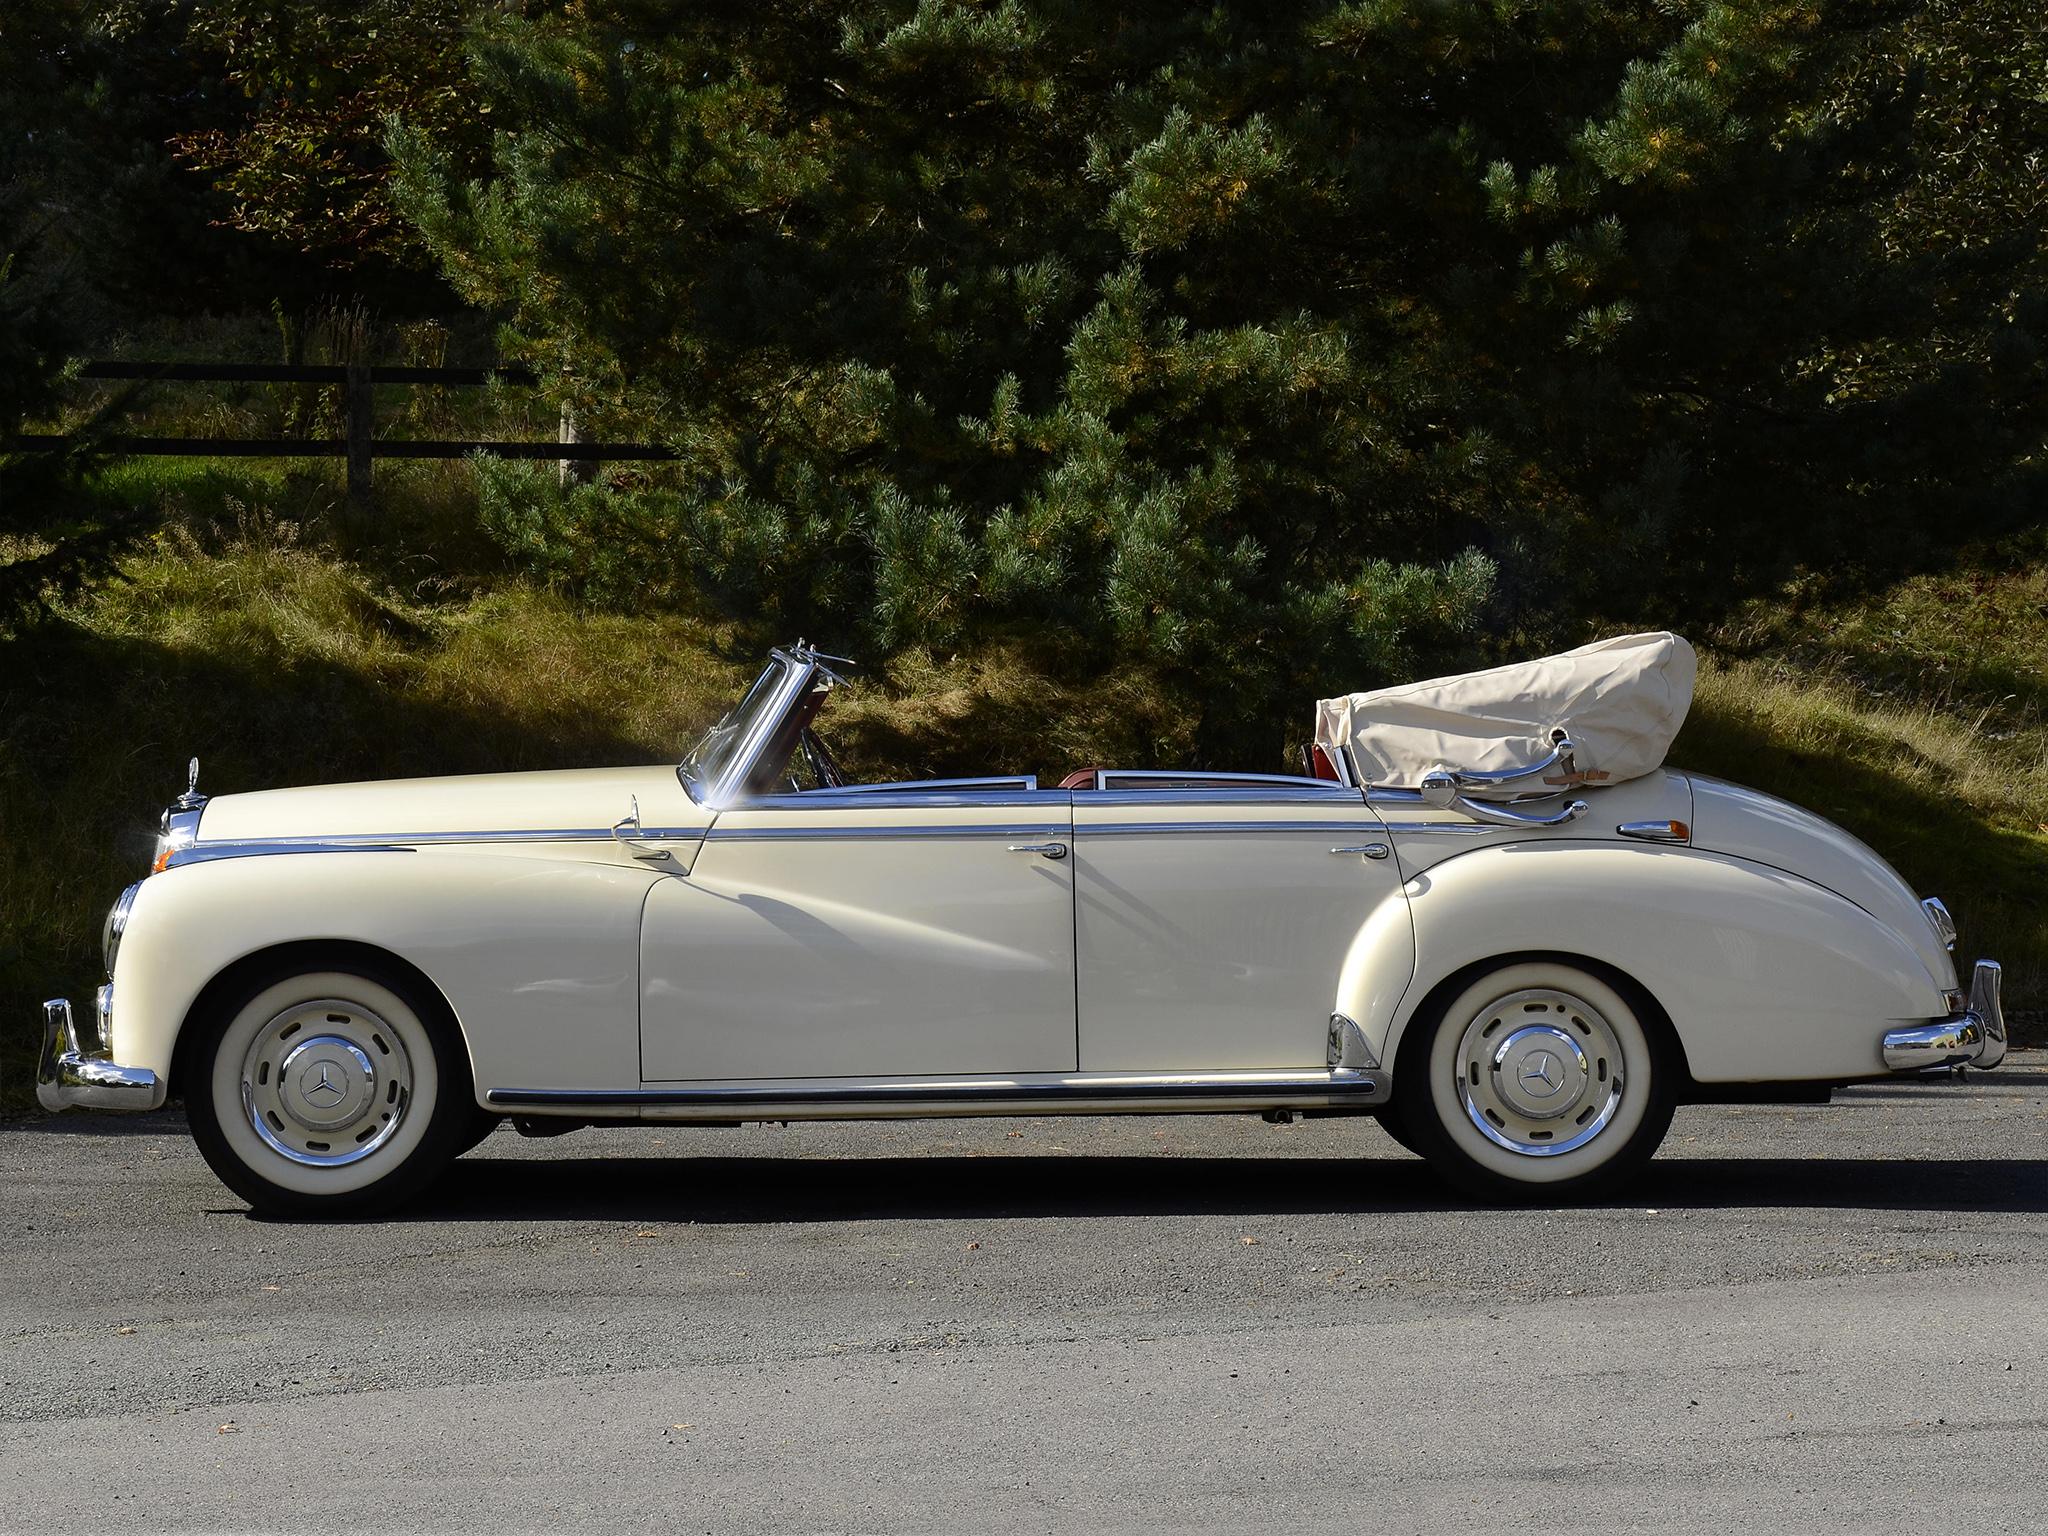 1951 mercedes benz 300 cabriolet d w186 luxury retro m for Mercedes benz retro